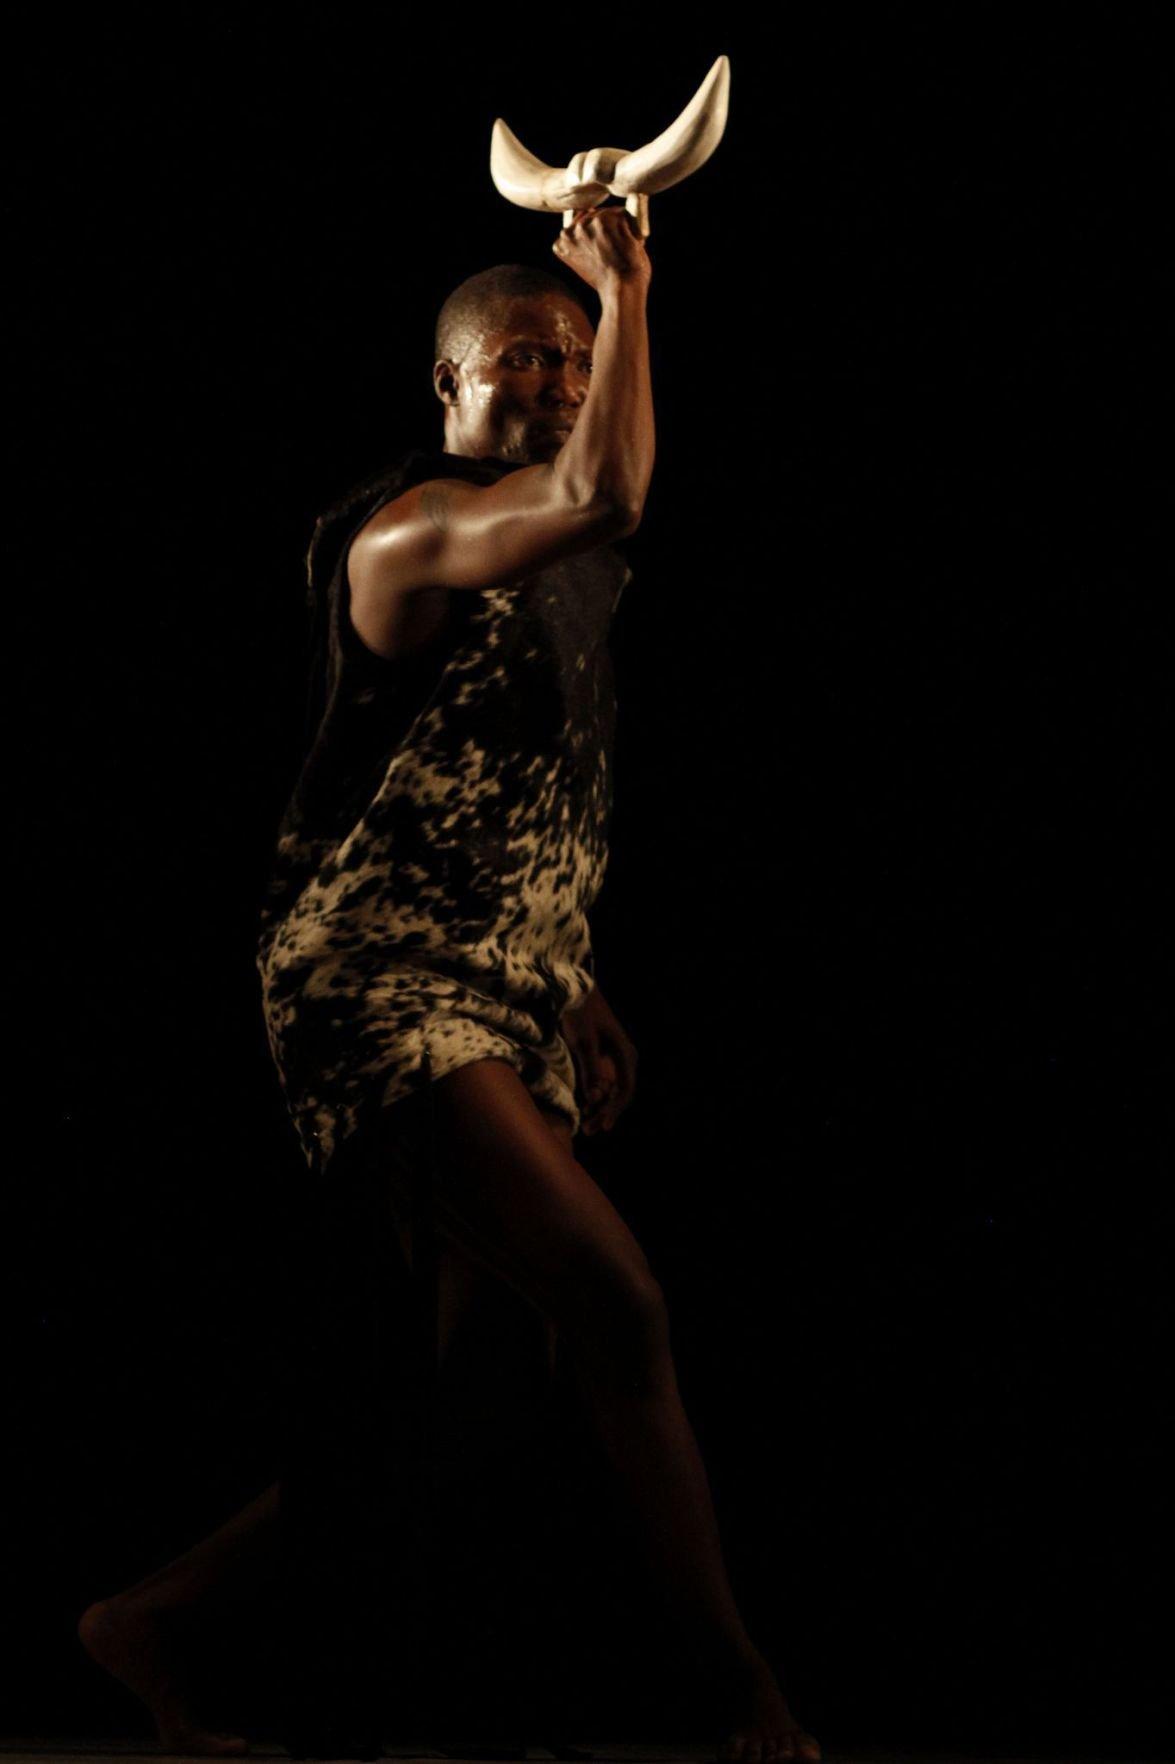 Dance abounds at Spoleto festivals